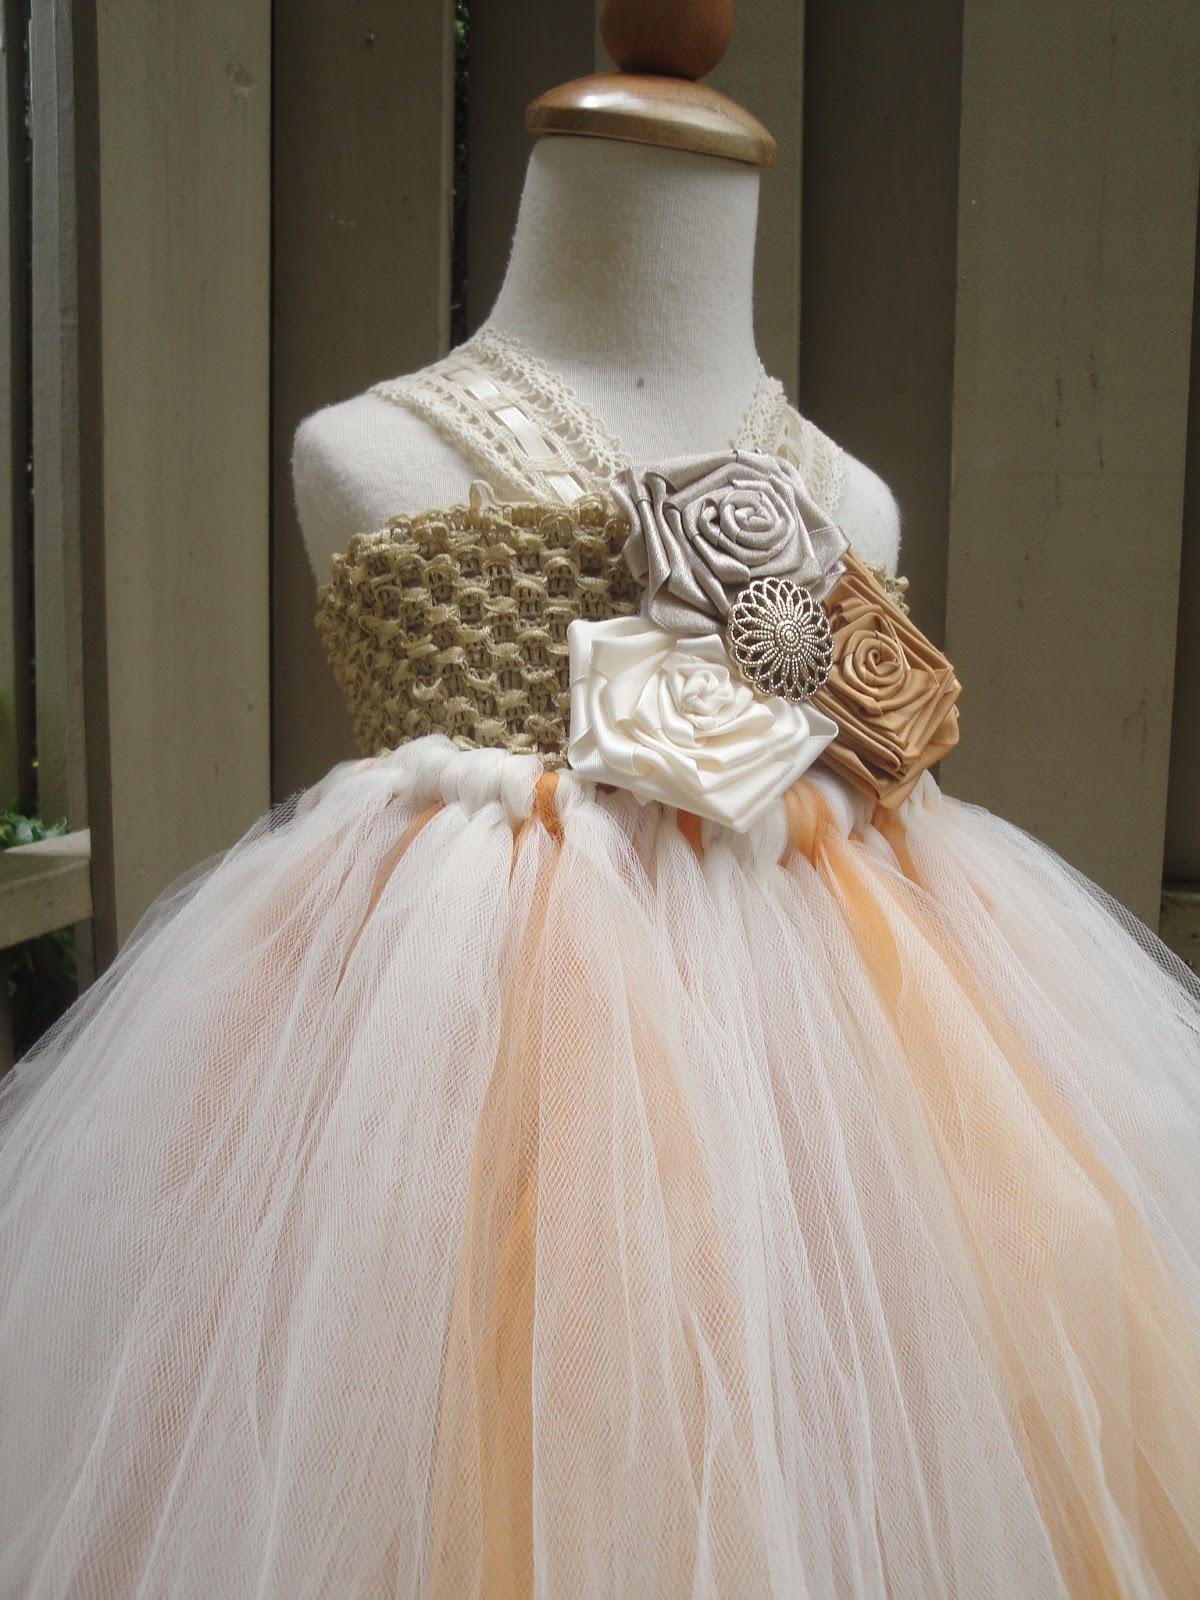 Rustic champagne gold flower girl tutu dress